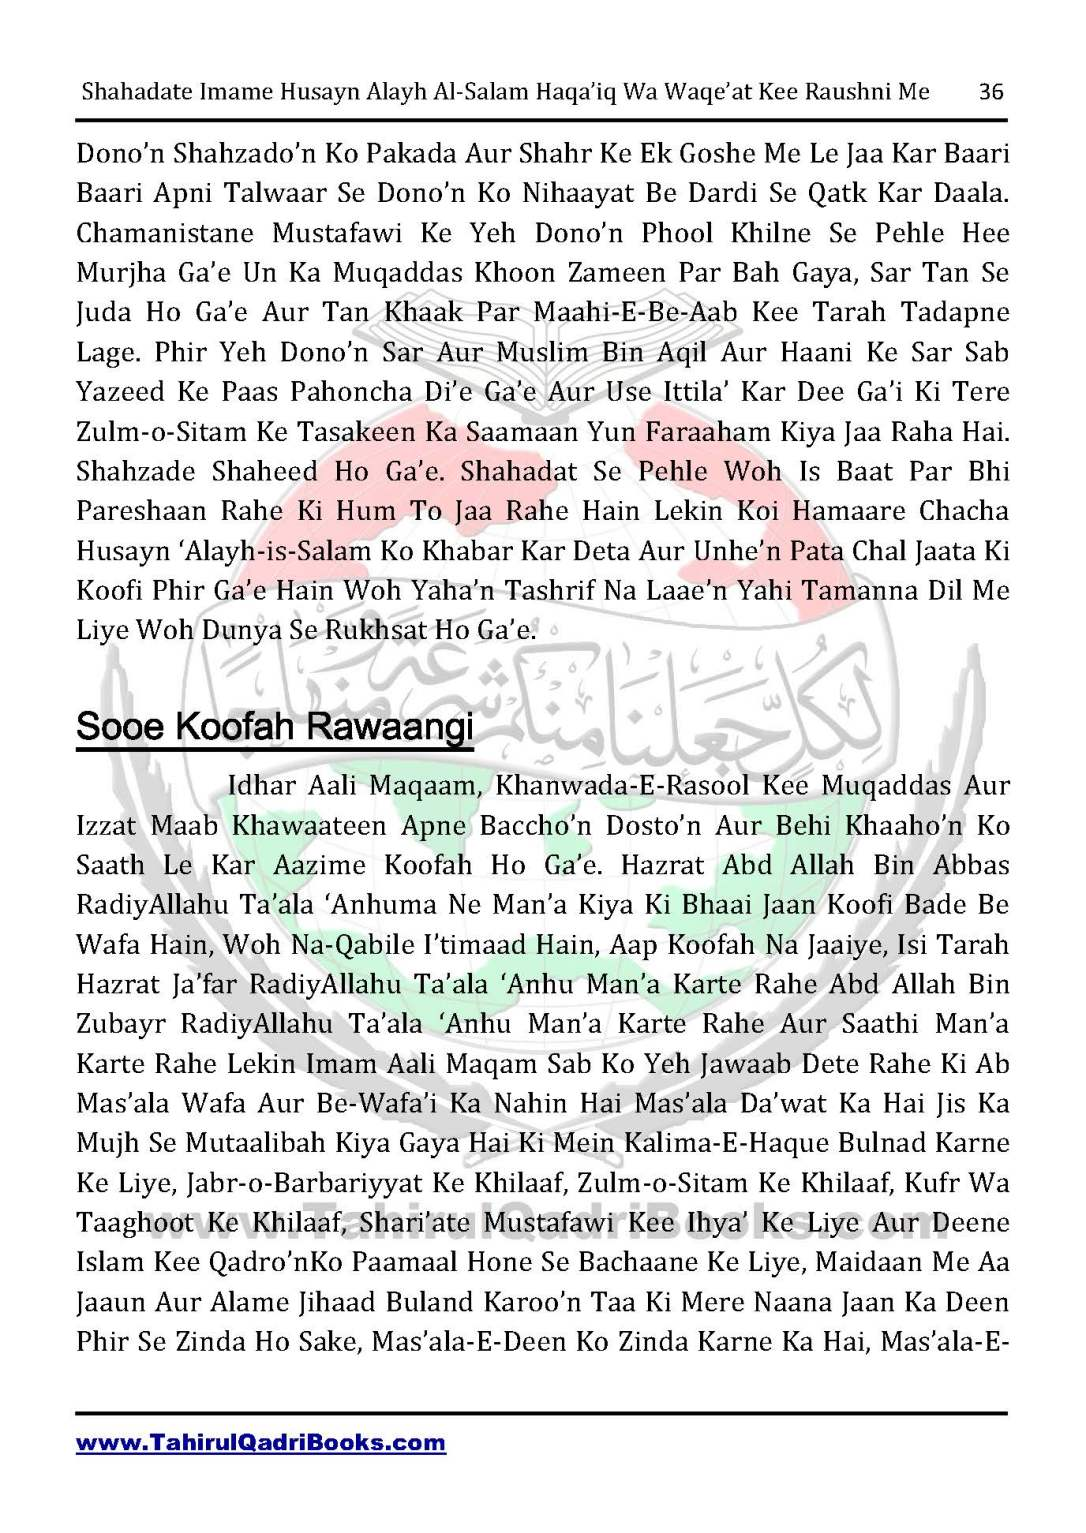 shahadate-imame-husayn-alayh-is-salam-haqaiq-wa-waqe_at-kee-raushni-me-in-roman-urdu-unlocked_Page_36